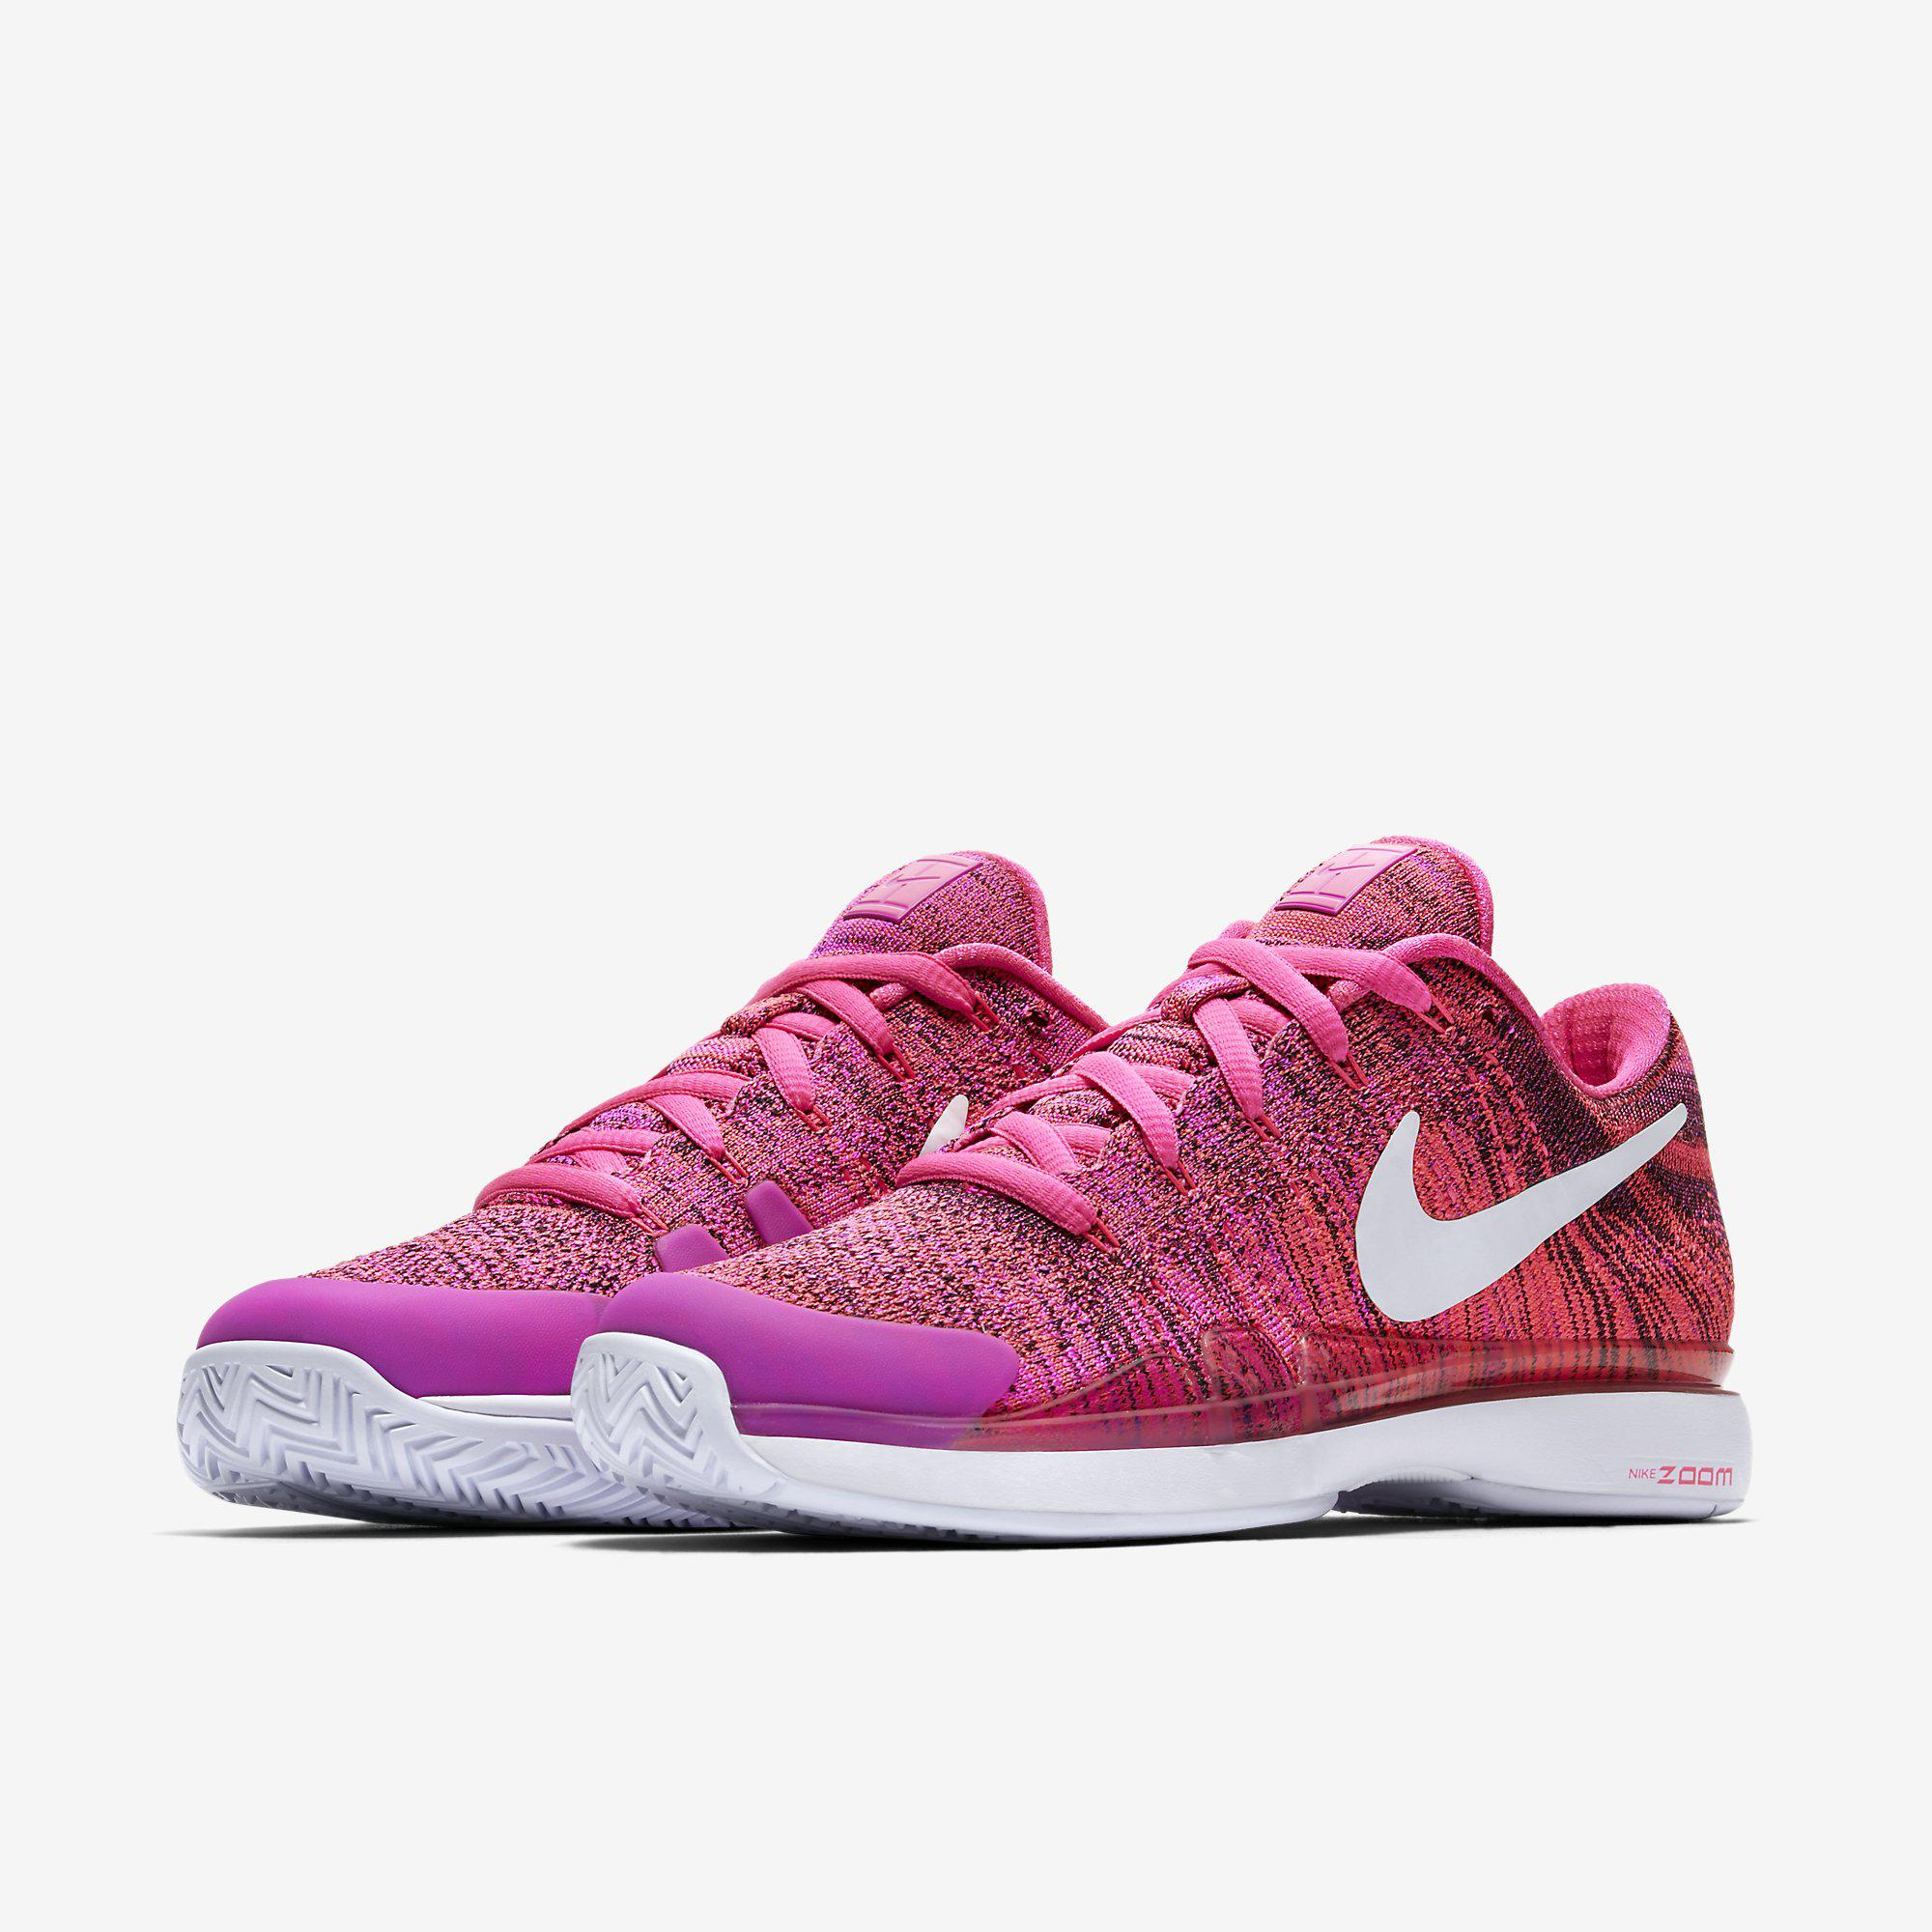 b0442cd150c2 Nike Womens Zoom Vapor 9.5 Flyknit HC QS Tennis Shoes - Pink ...